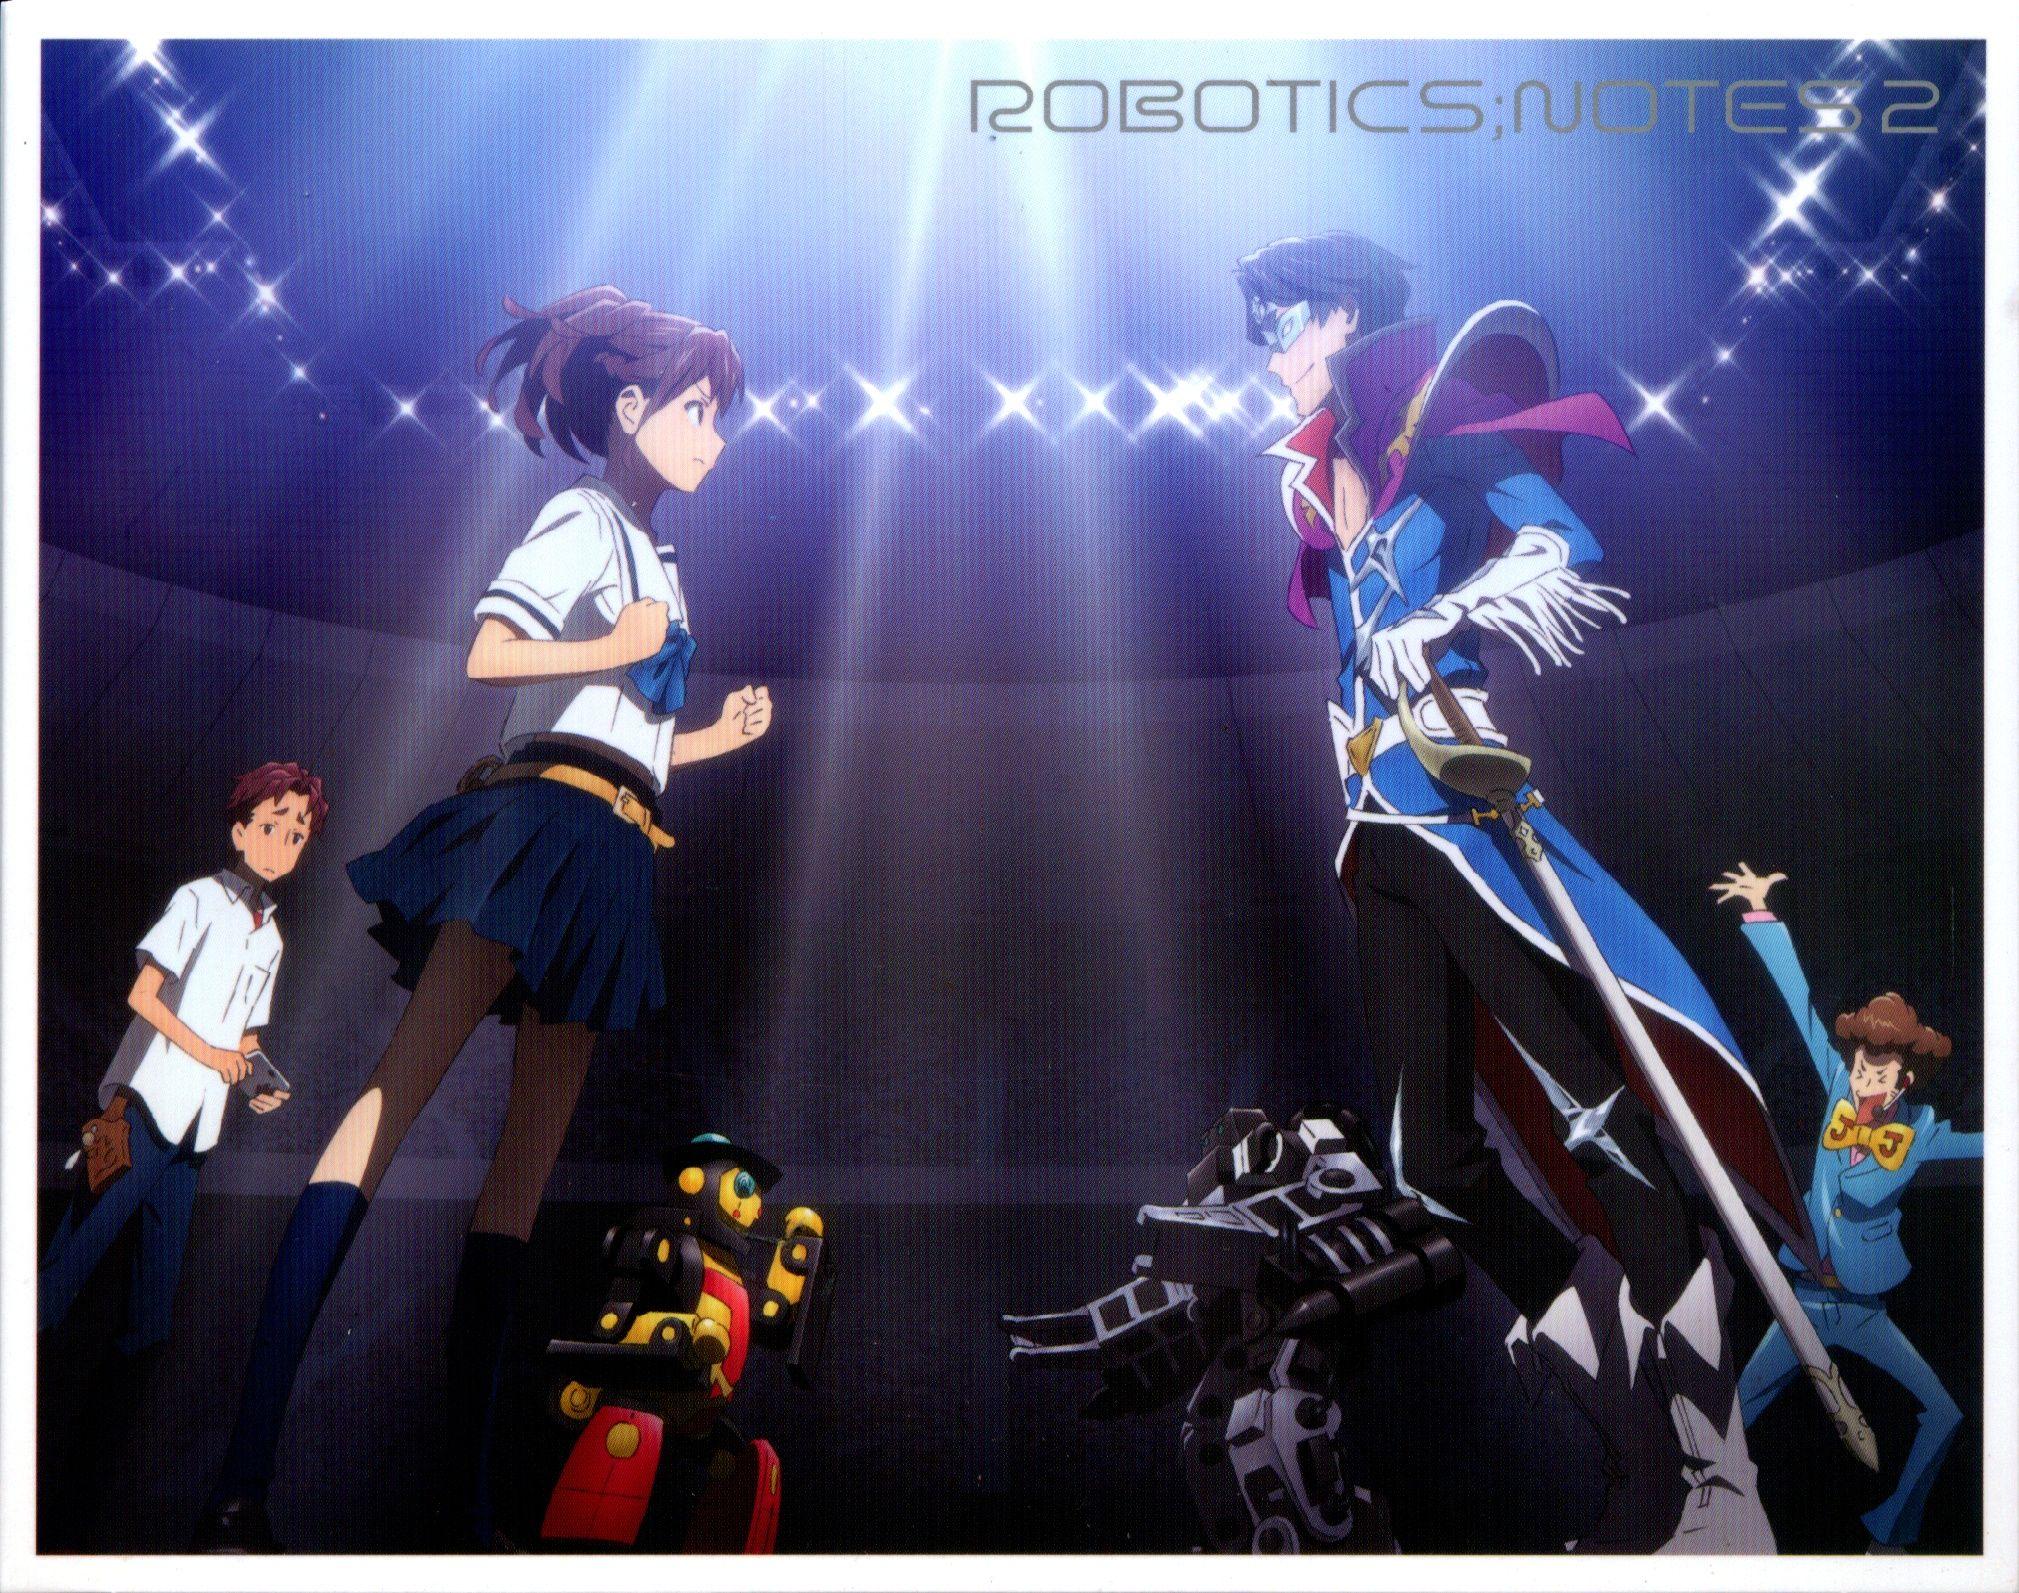 Robotics;Notes Anime images, Anime, Image